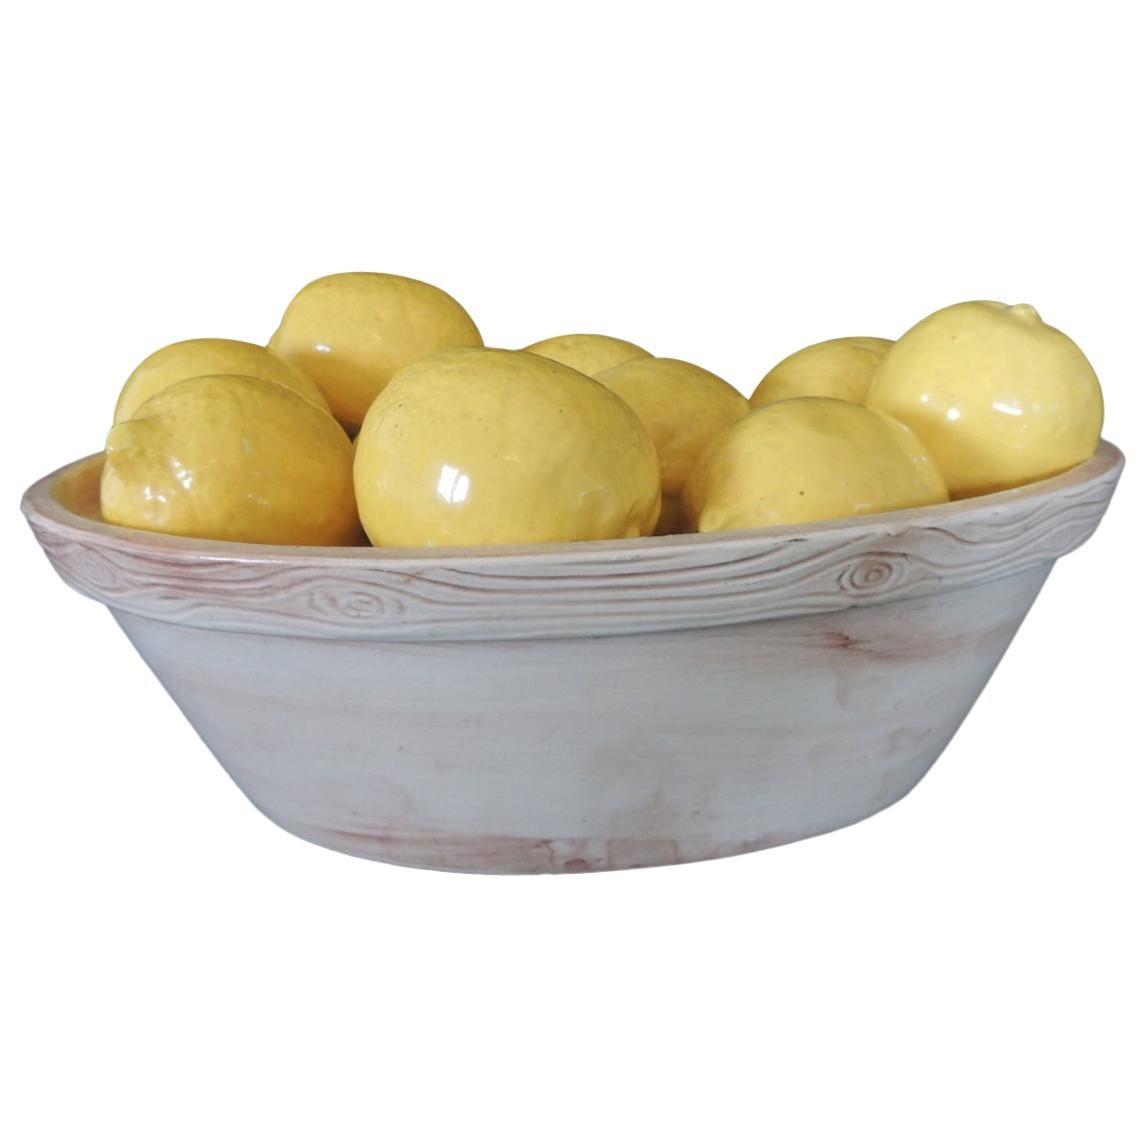 Trompe-L'oeil Lemons inside Faux Wooden Porcelain Basket